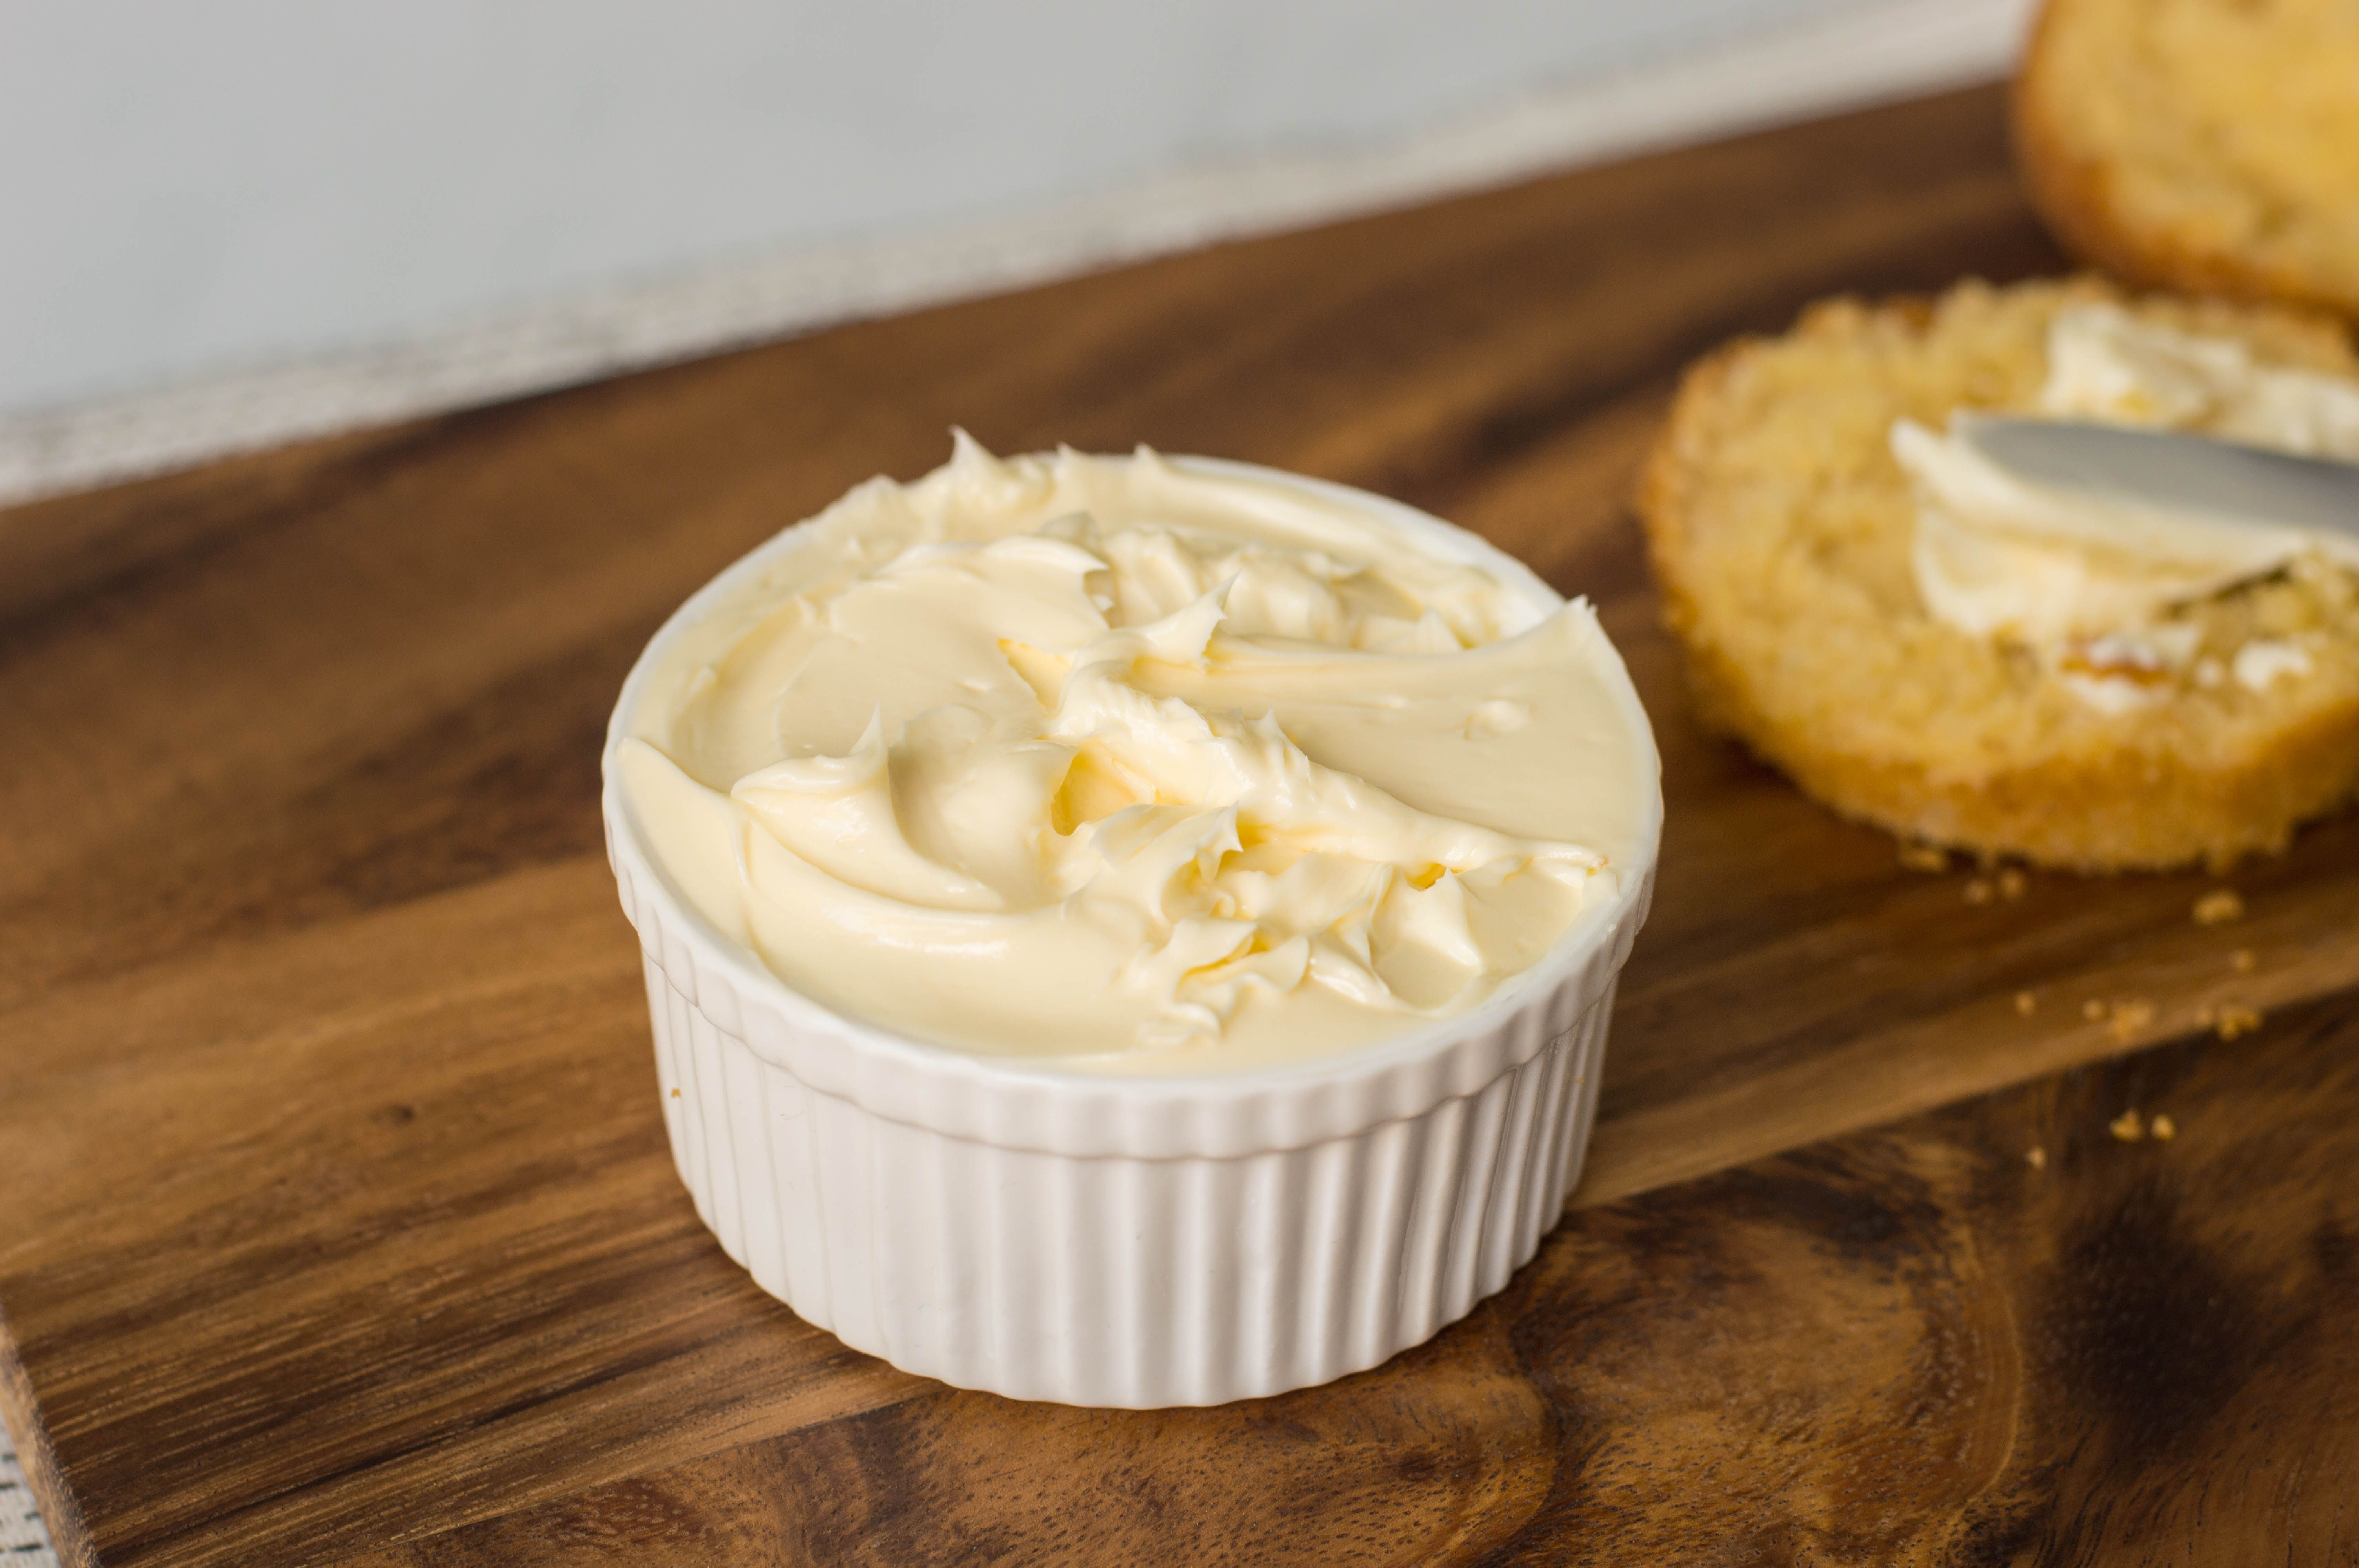 Homemade whipped butter in a ramekin